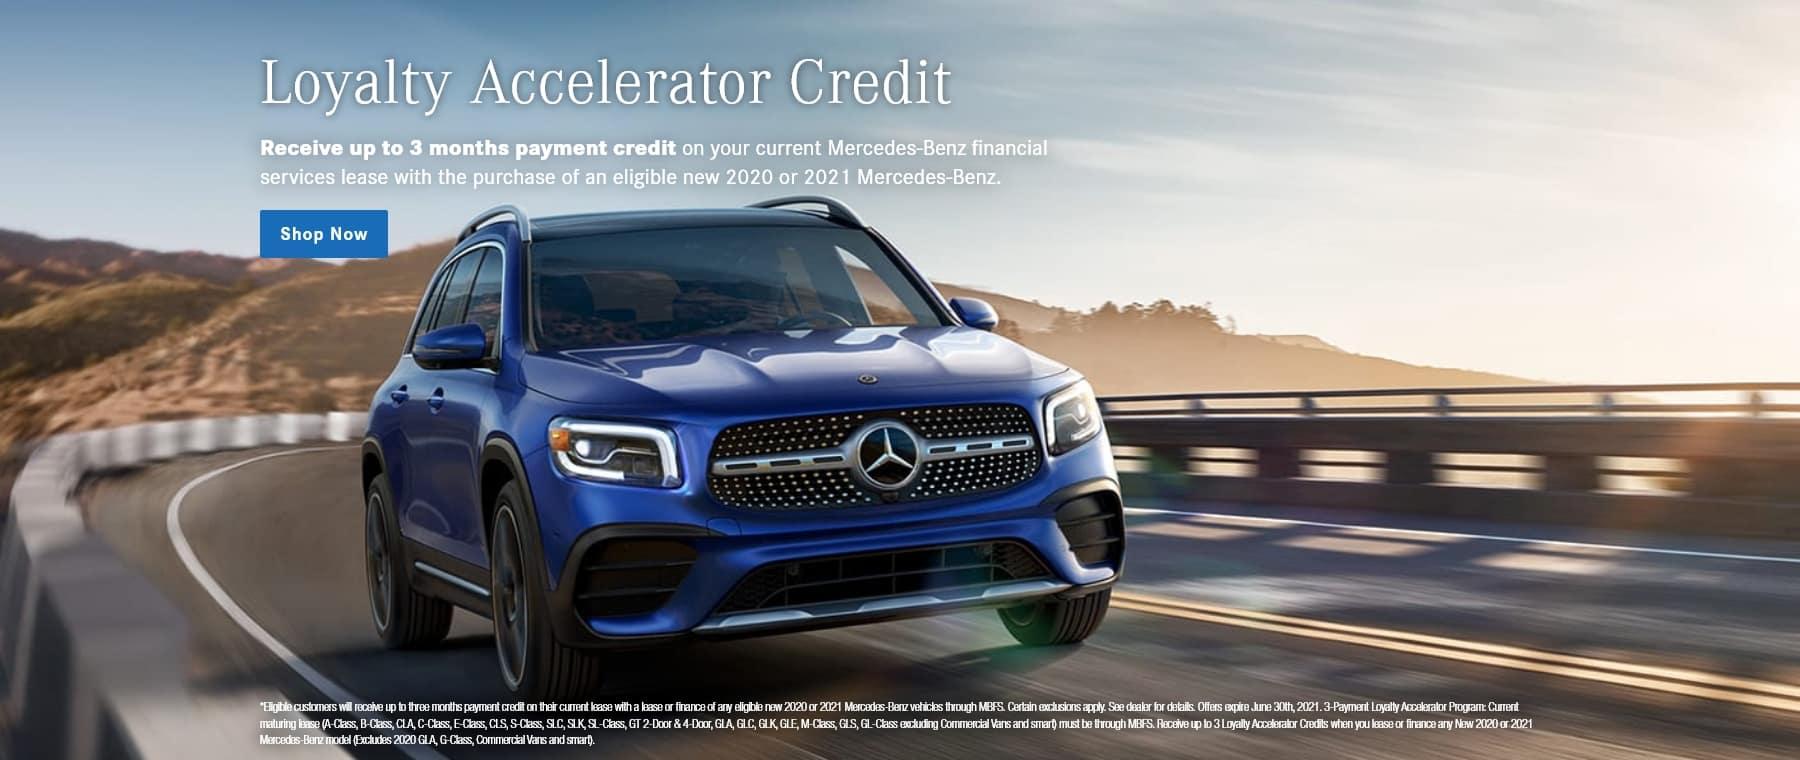 Loyalty Accelerator Credit